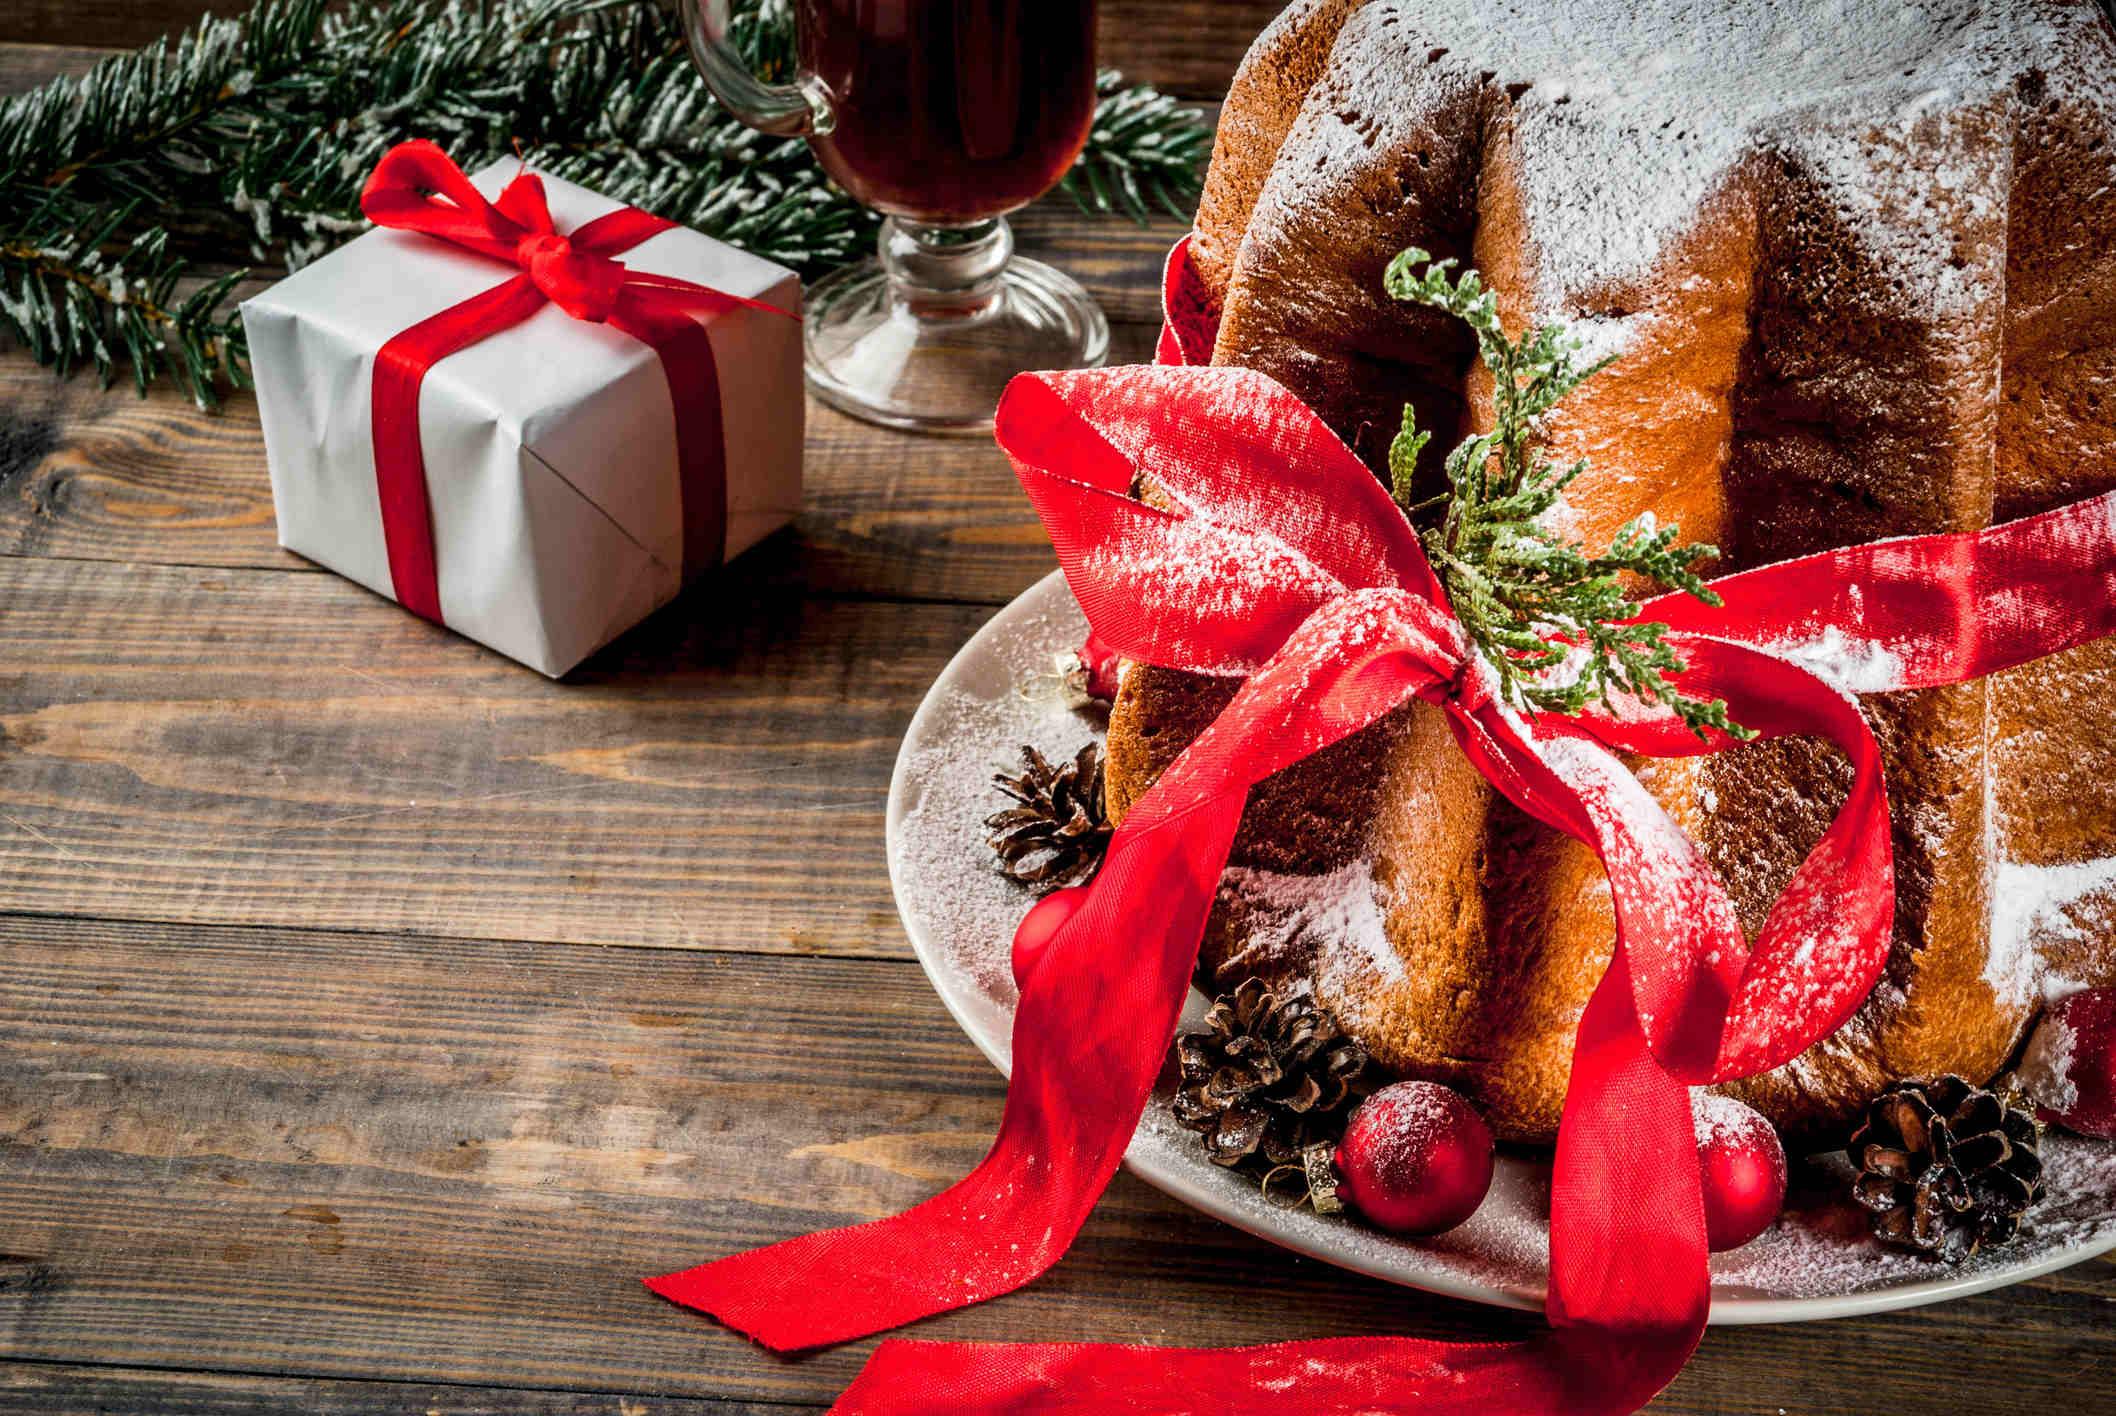 , PANDORO: HISTORY OF A CHRISTMAS CAKE AND ITS INVENTOR, DOMENICO MELEGATTI, Foodiestrip.blog